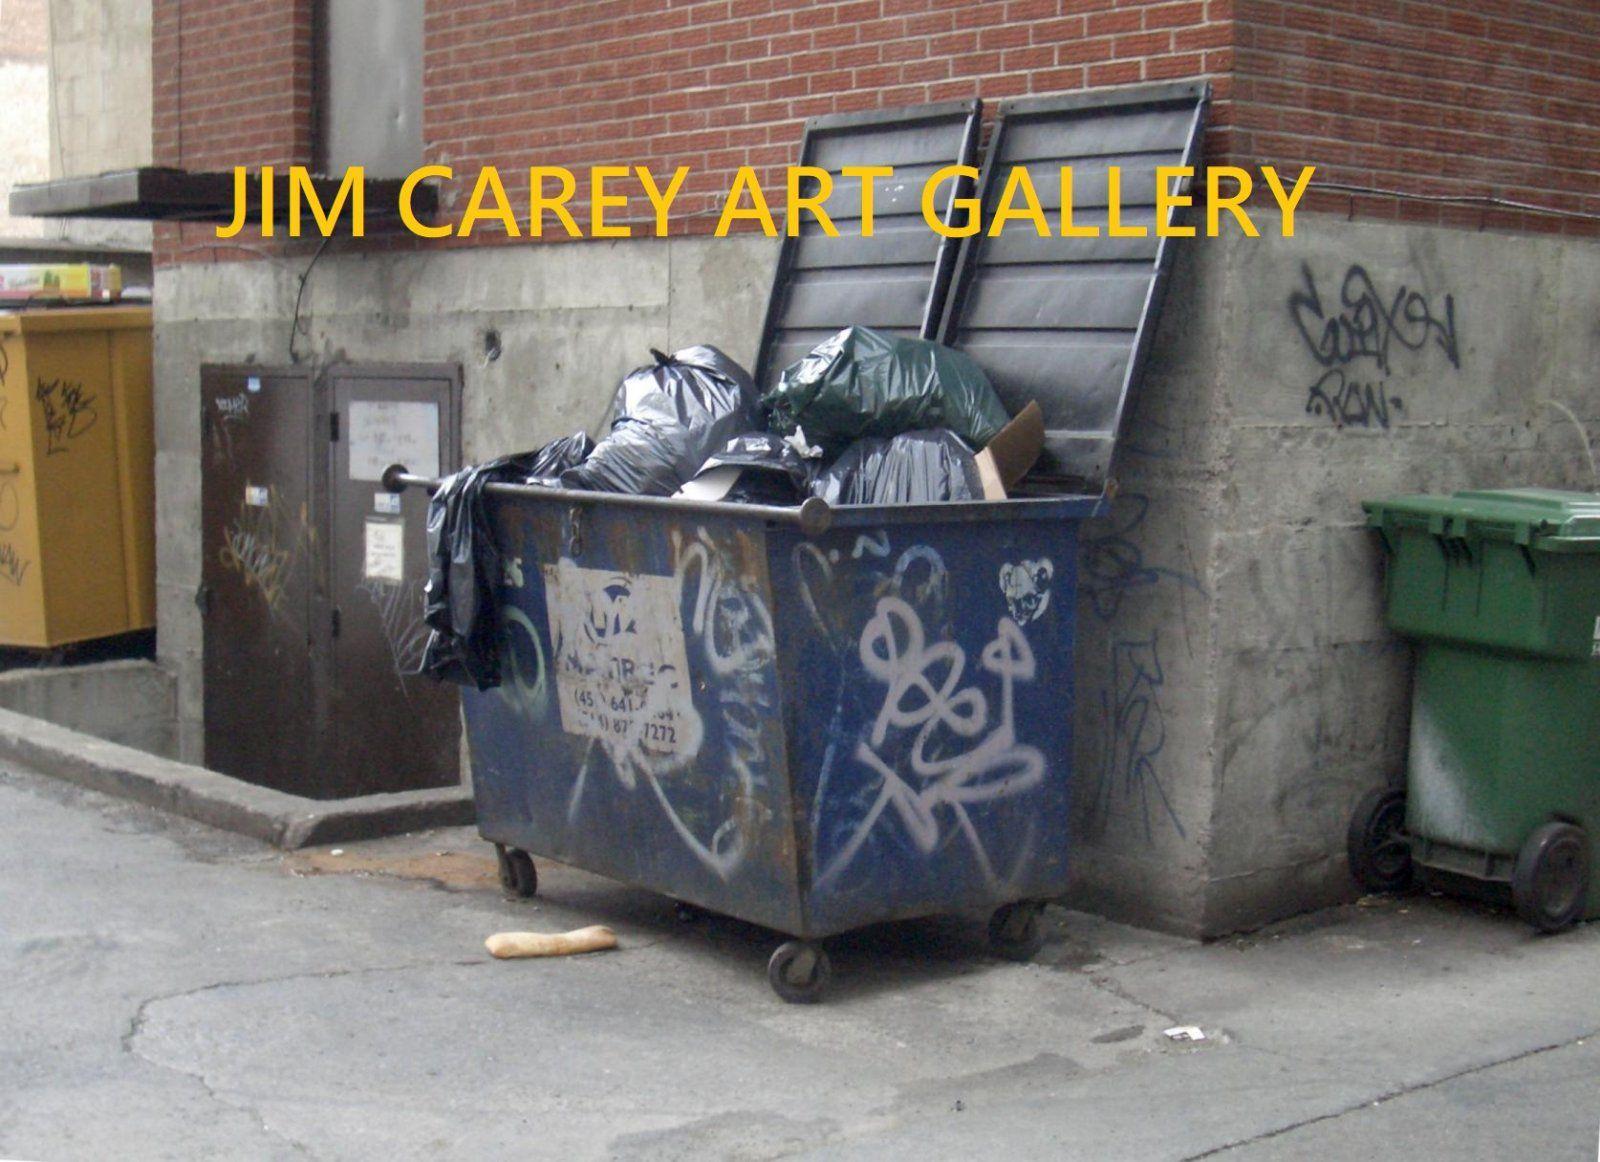 jimcaryartgallerydumpster.jpg